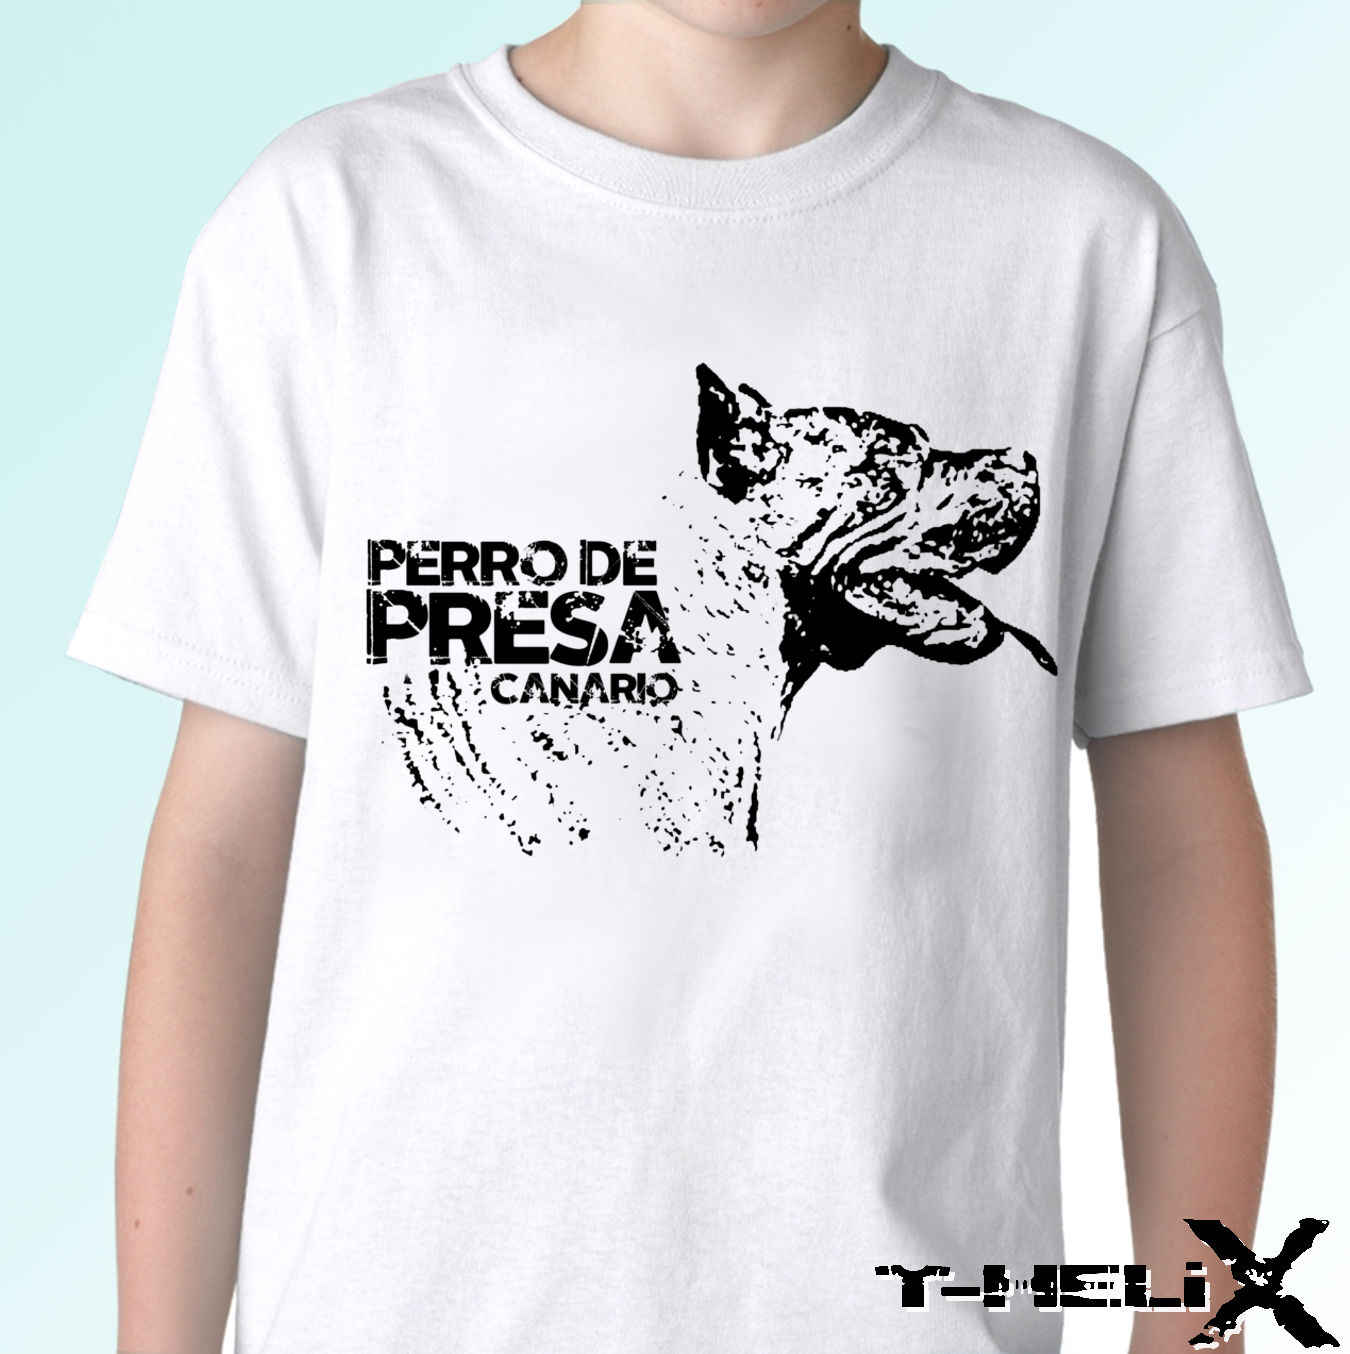 CANARY ISLANDS PERRO DE PRESA CANARIO T SHIRT TOP TEE DOG BREED DESIGN UNISEX